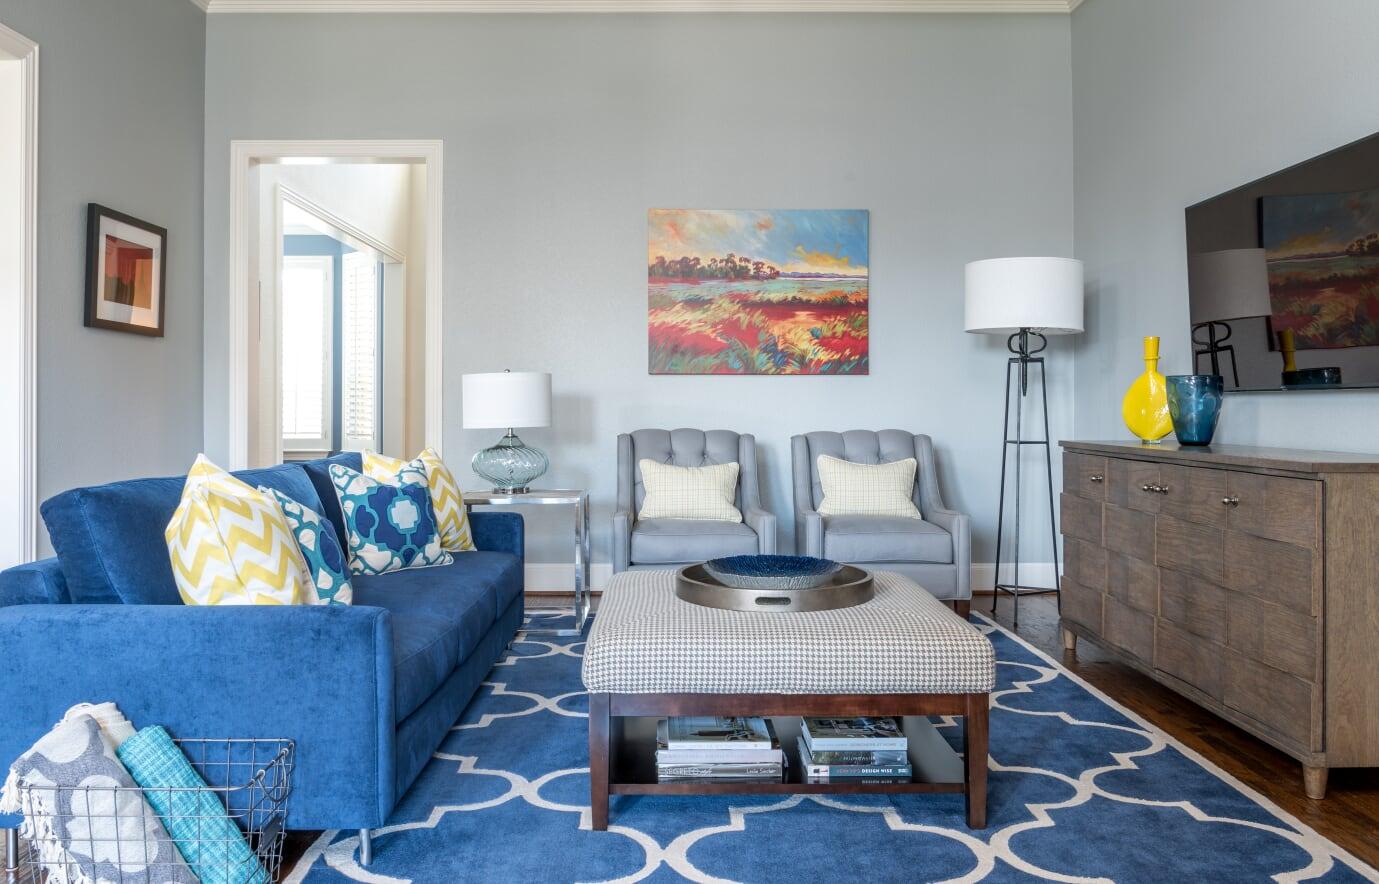 Home Tours 56 - Dallas Interior Designer serving Plano, Frisco, Dallas, Allen for Decorating Den Interiors D'KOR HOME by Dee Frazier Interiors